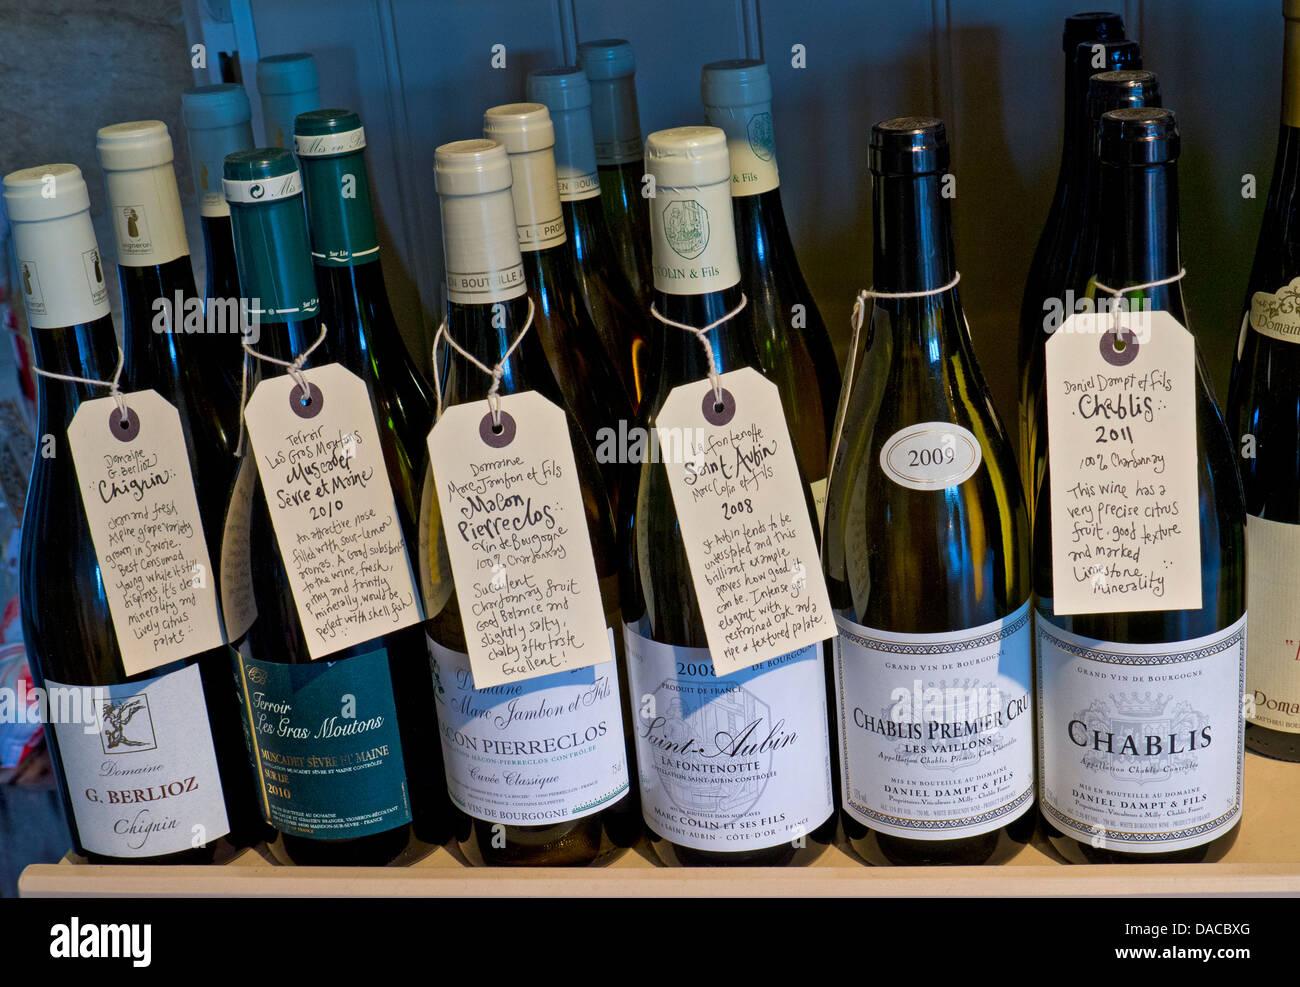 wine bottles for sale